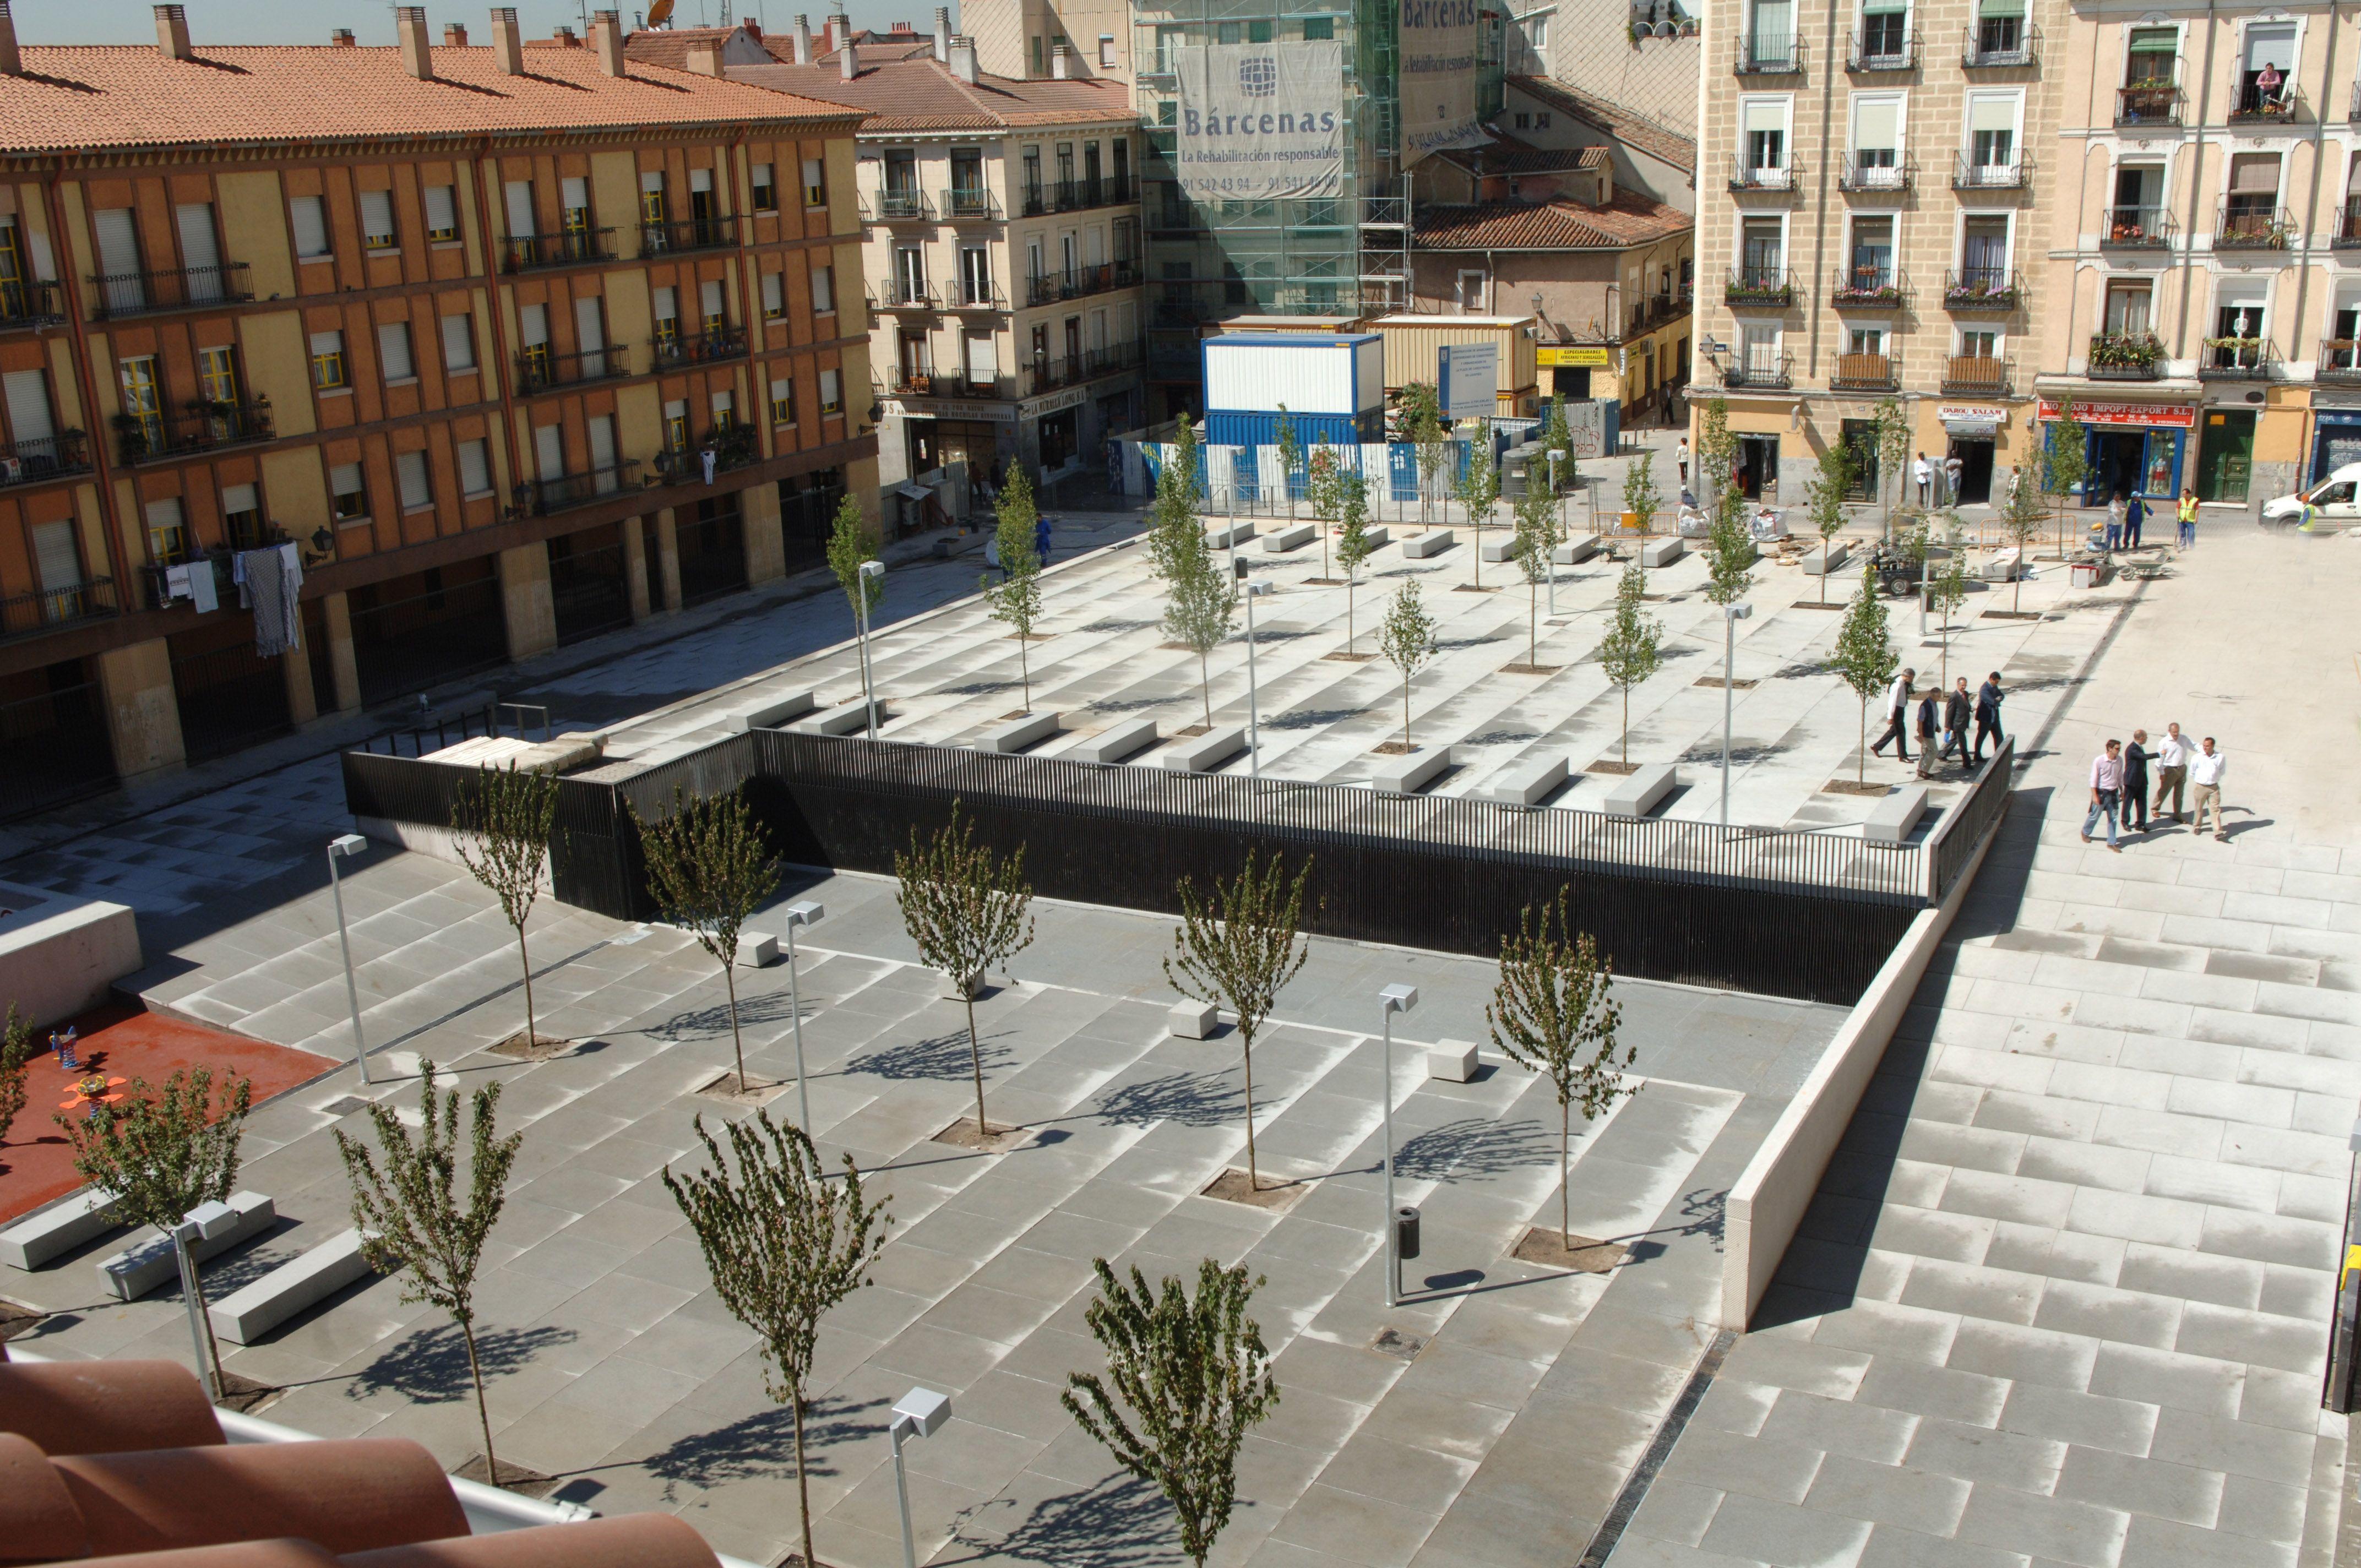 Plaza De Cabestreros Madrid